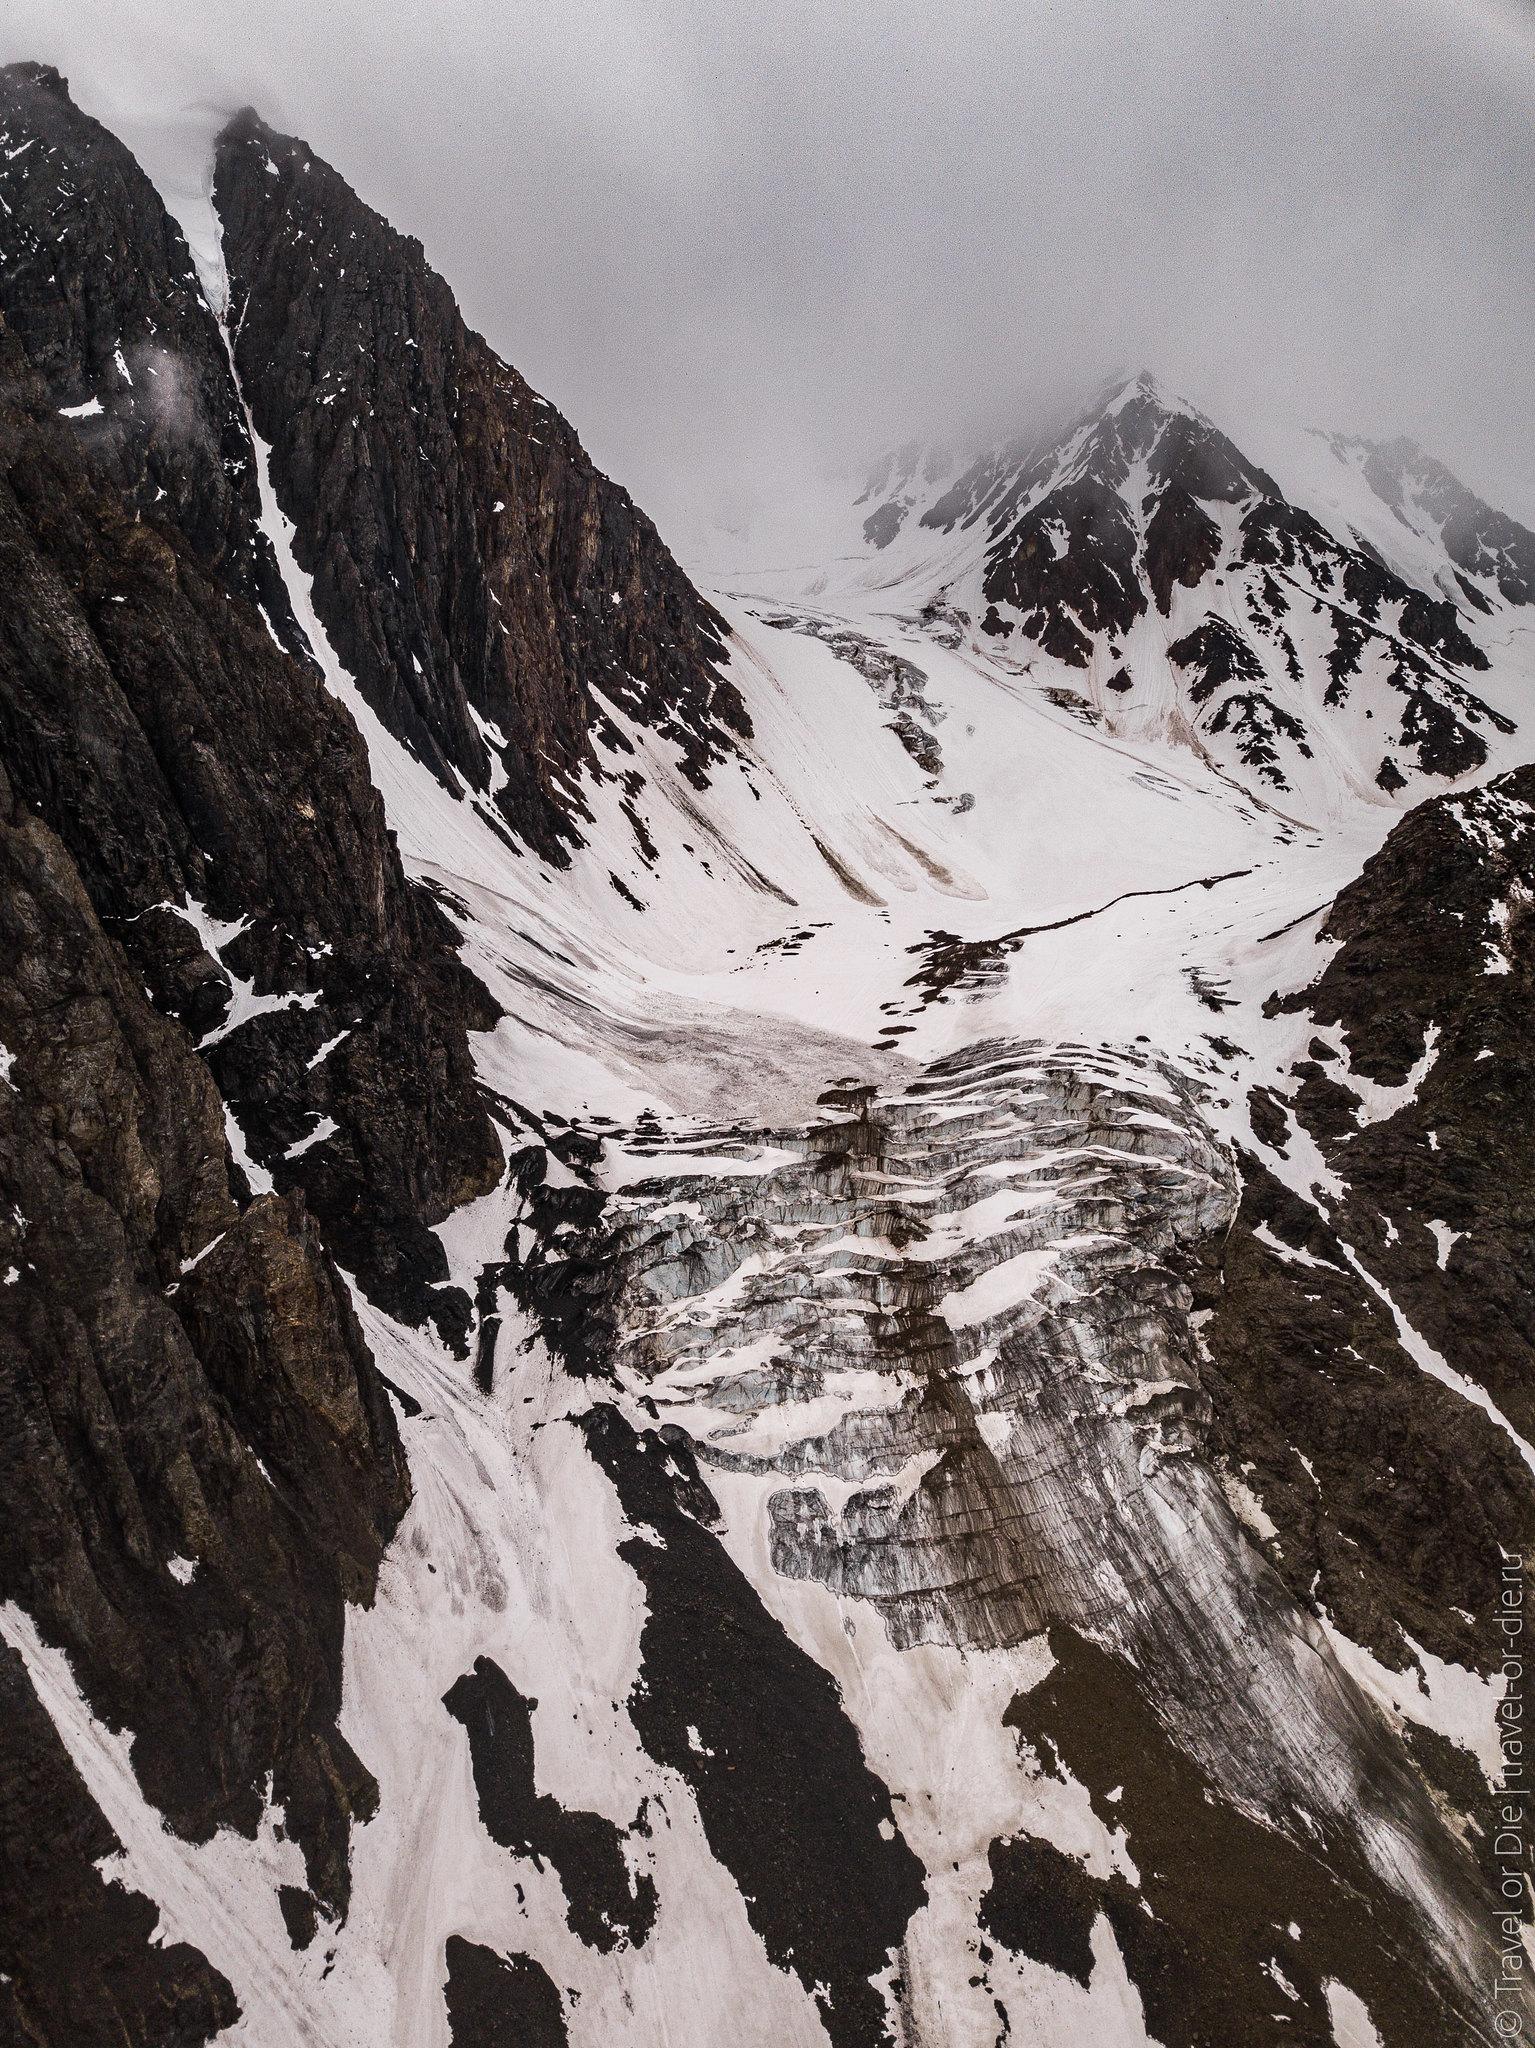 Aktru-Glacier-Altay-Ледник-Актру-Алтай-dji-mavic-0519